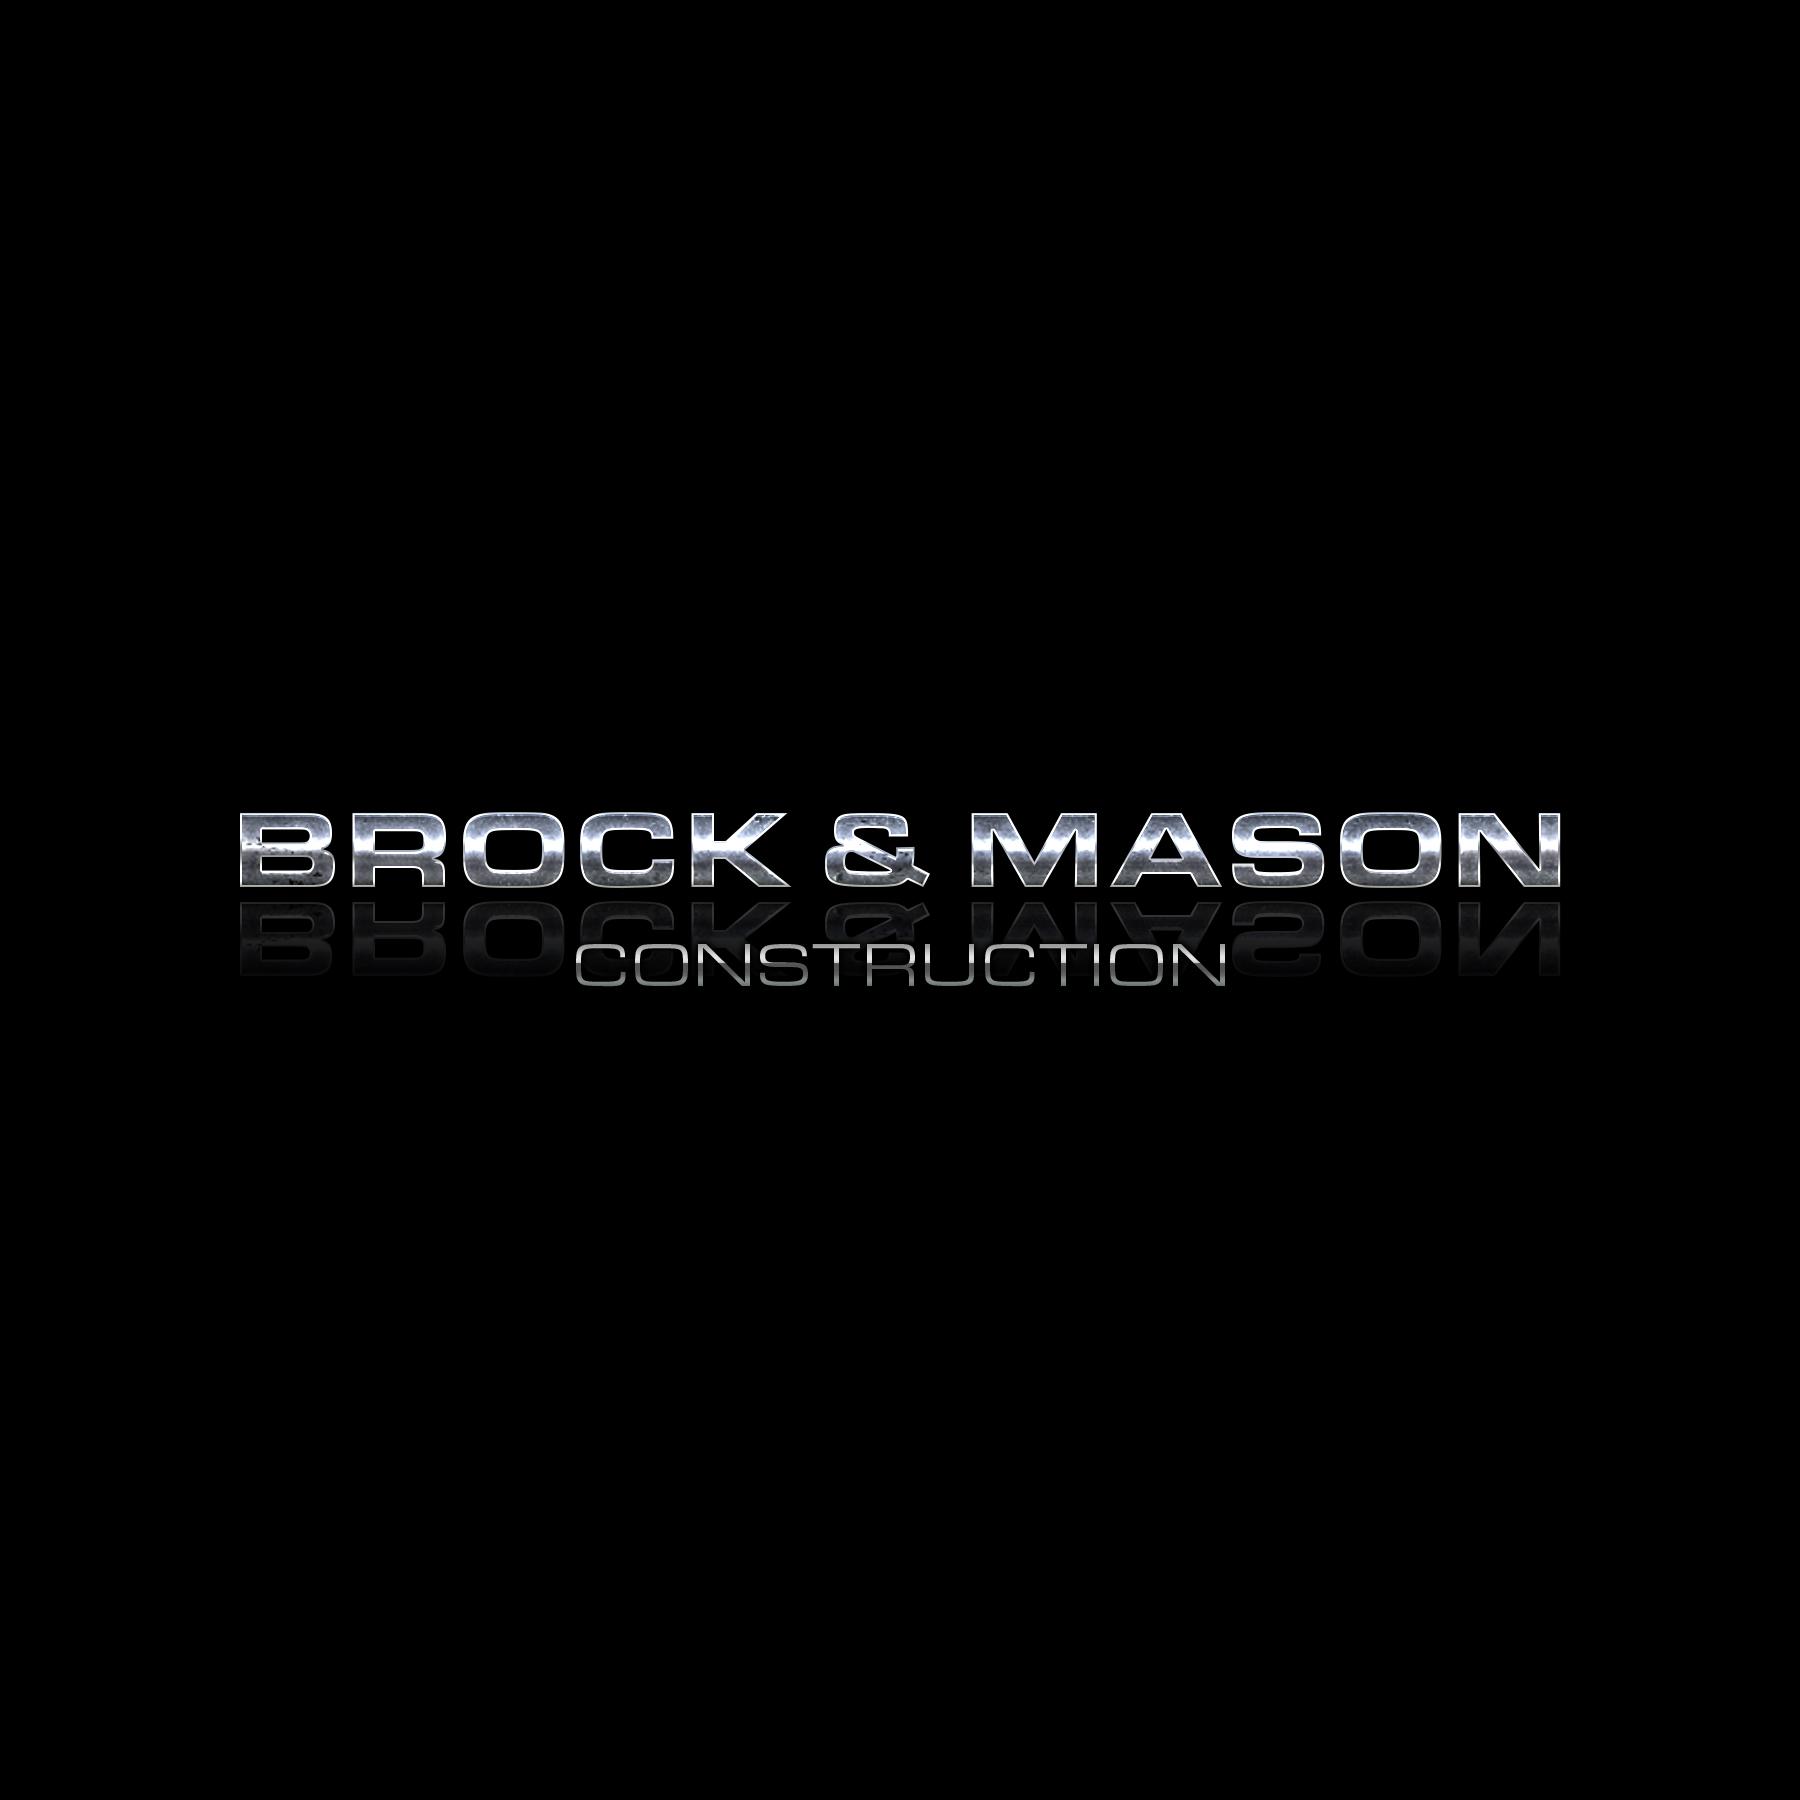 Euro Block Font Option Budget Logo Express Metallic Grunge Brock and Mason Construction black reflection by Brand G Creative 07 OCTOBER 2017.jpg